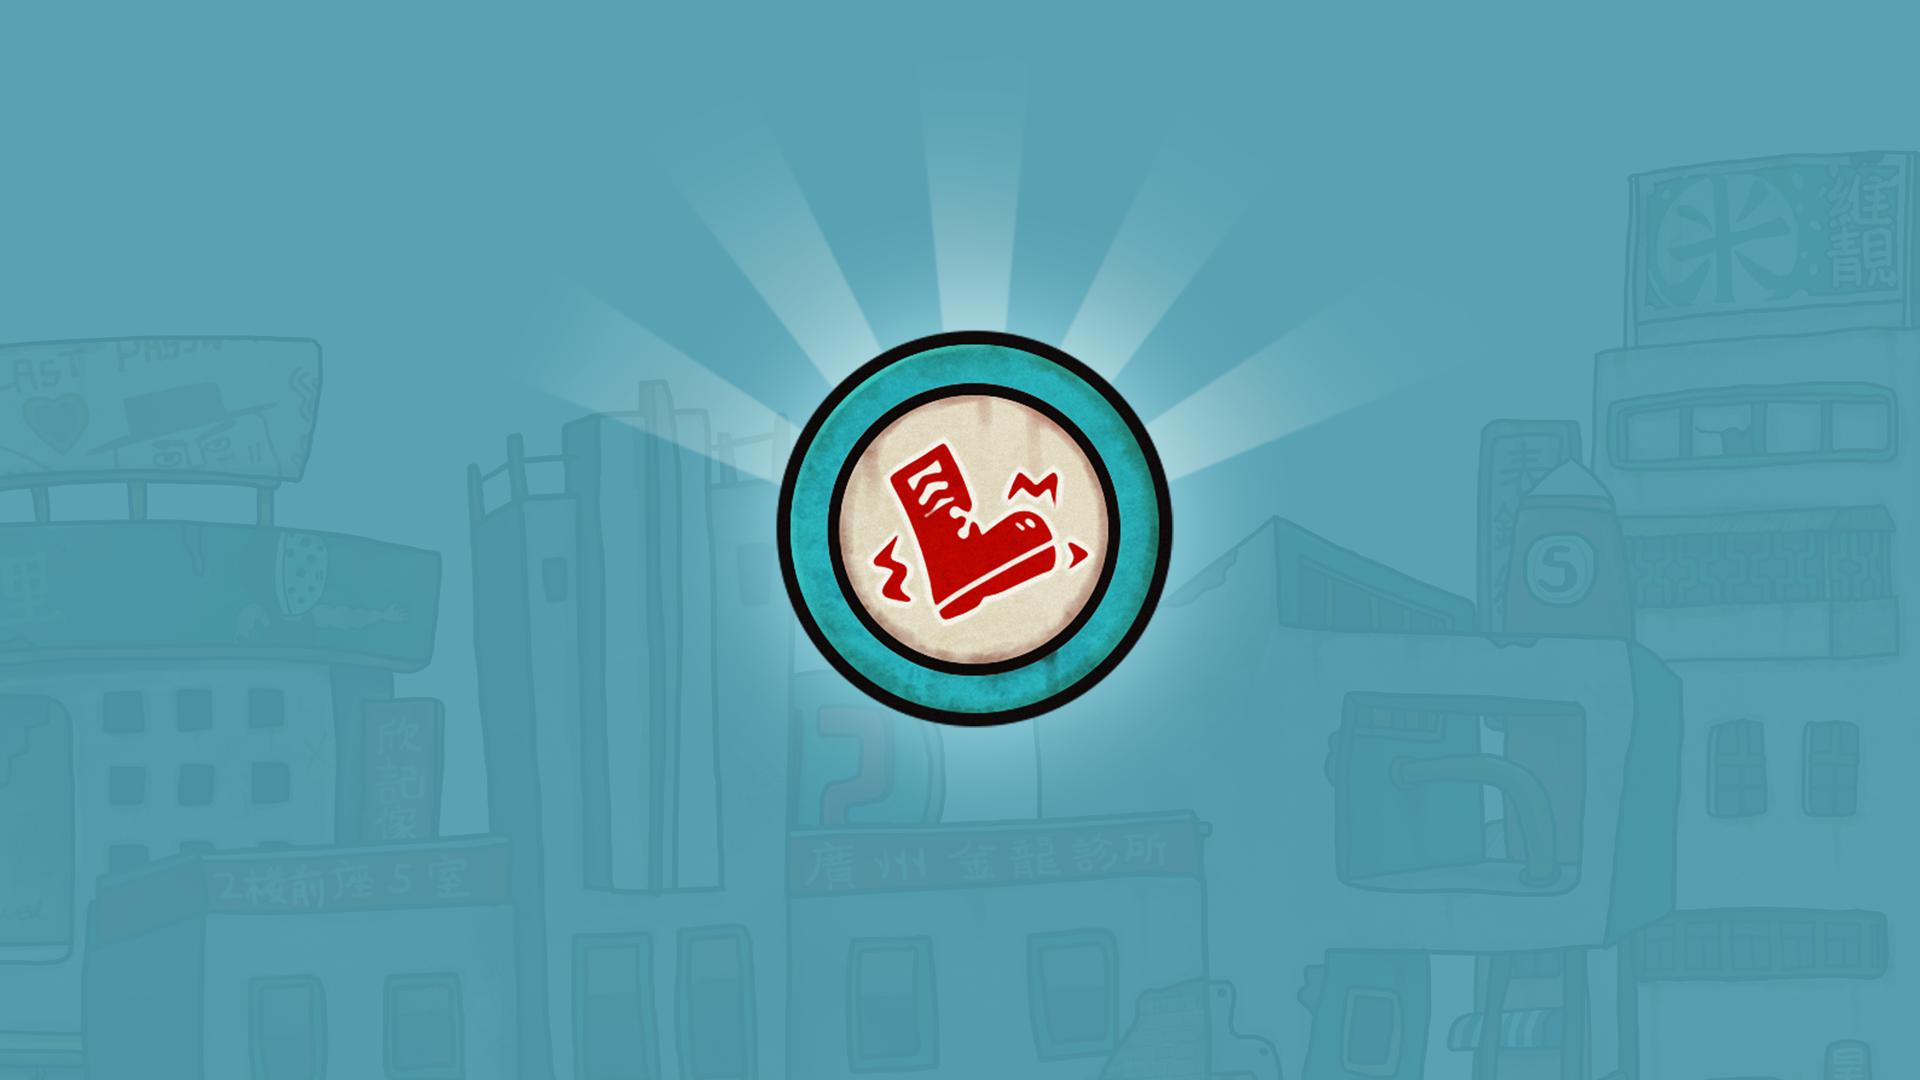 Icon for City Runner